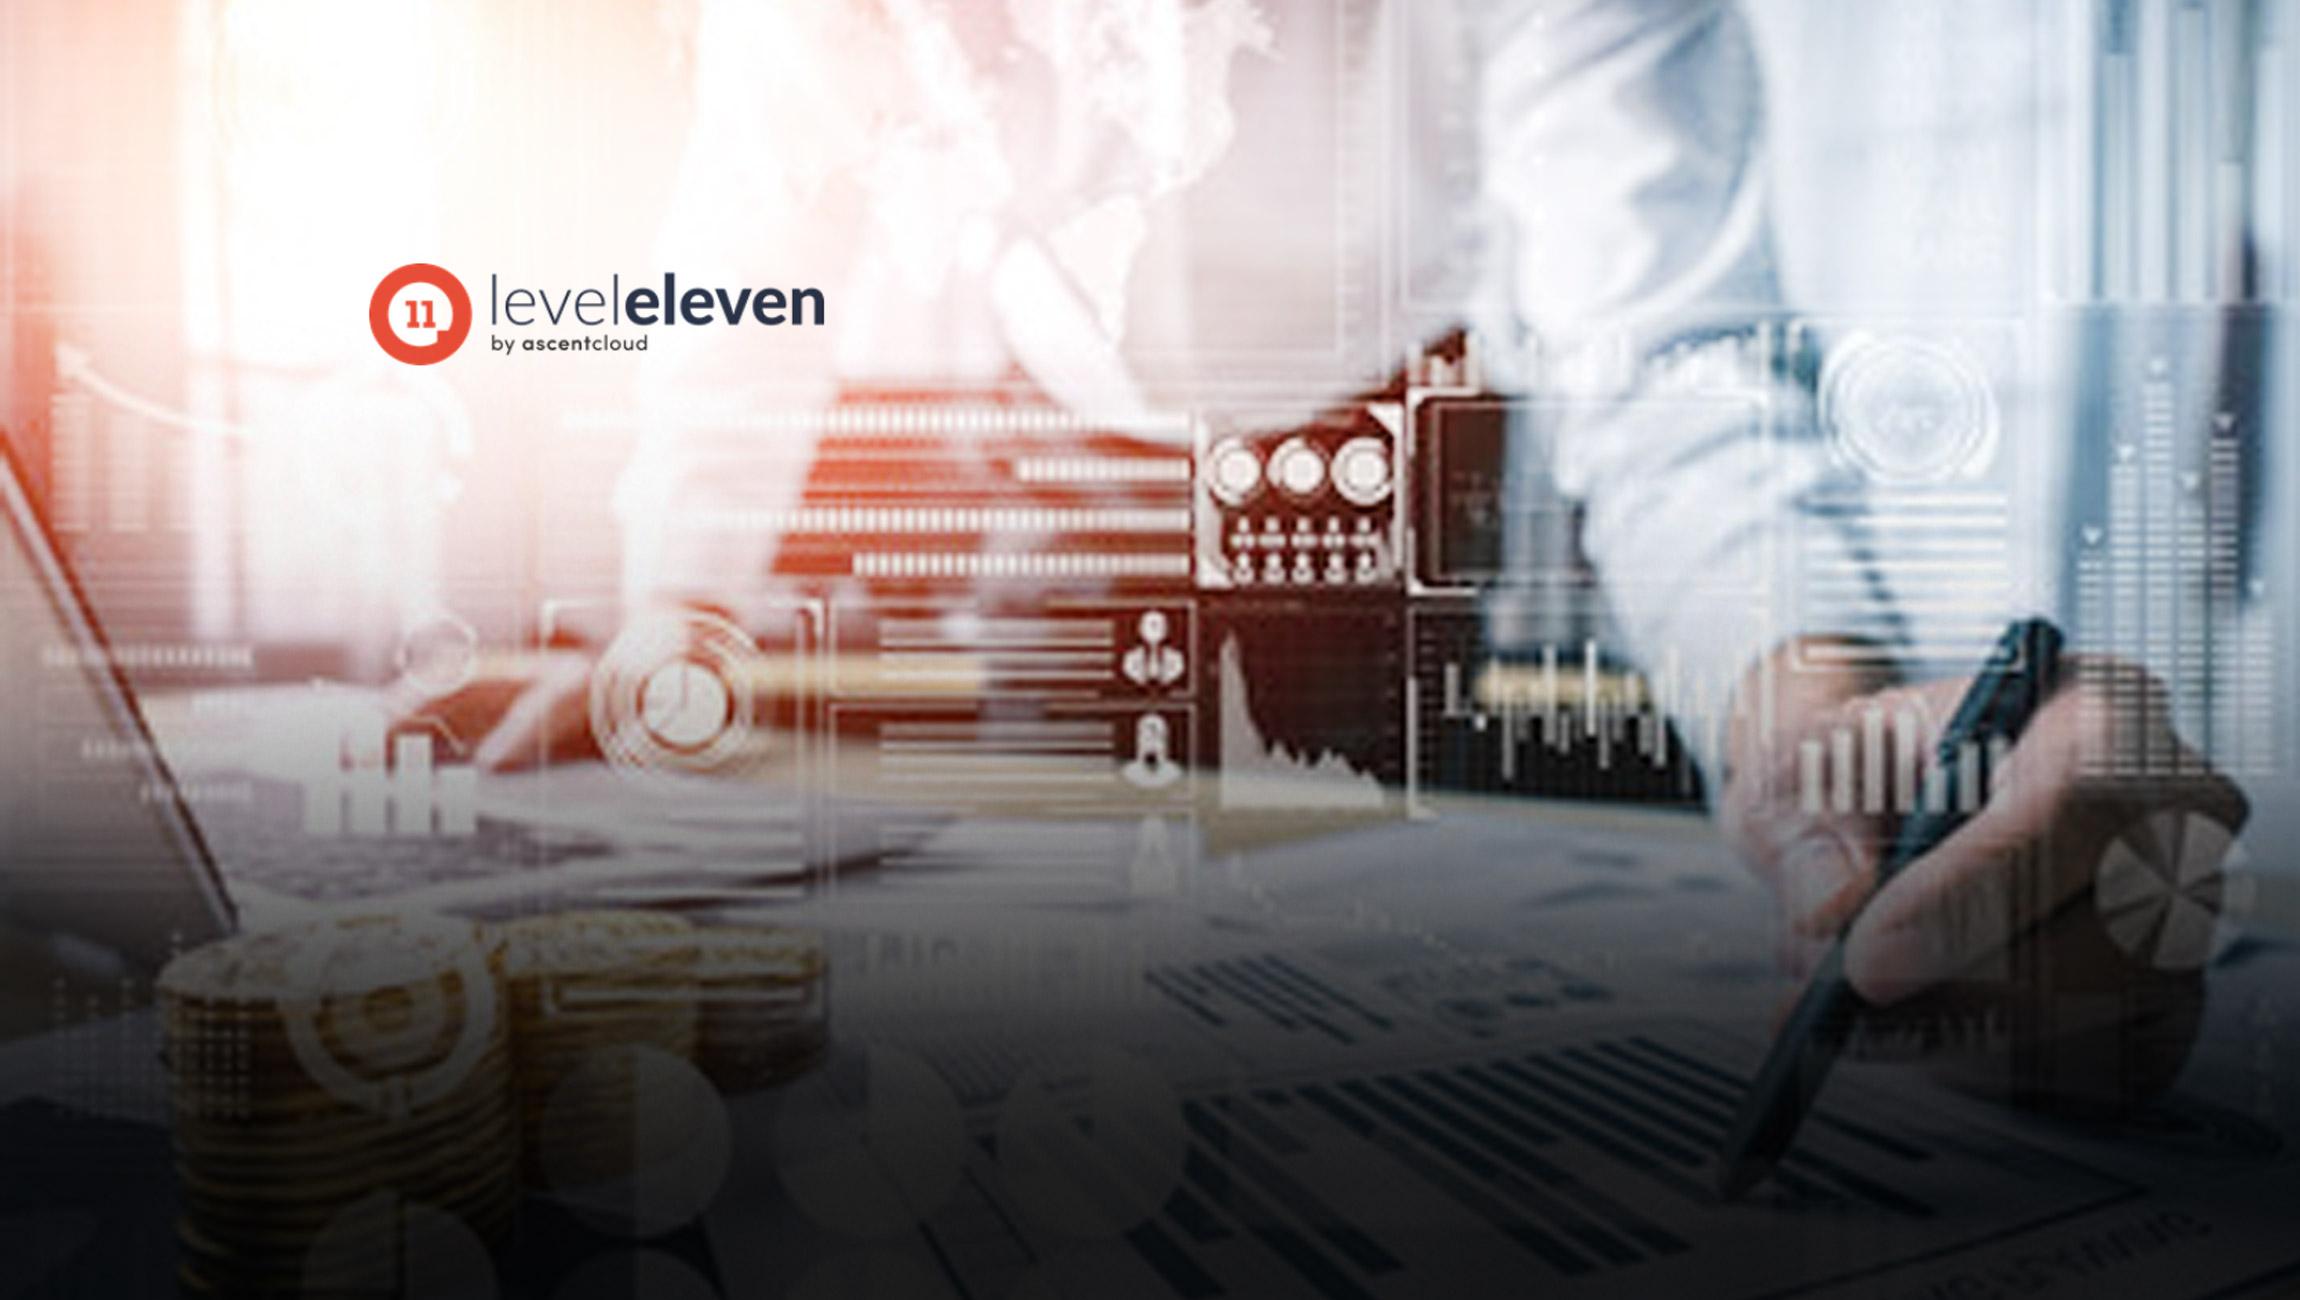 Ascent Cloud Announces Updates to LevelEleven Sales Performance Management Solution on Salesforce AppExchange, the World's Leading Enterprise Cloud Marketplace